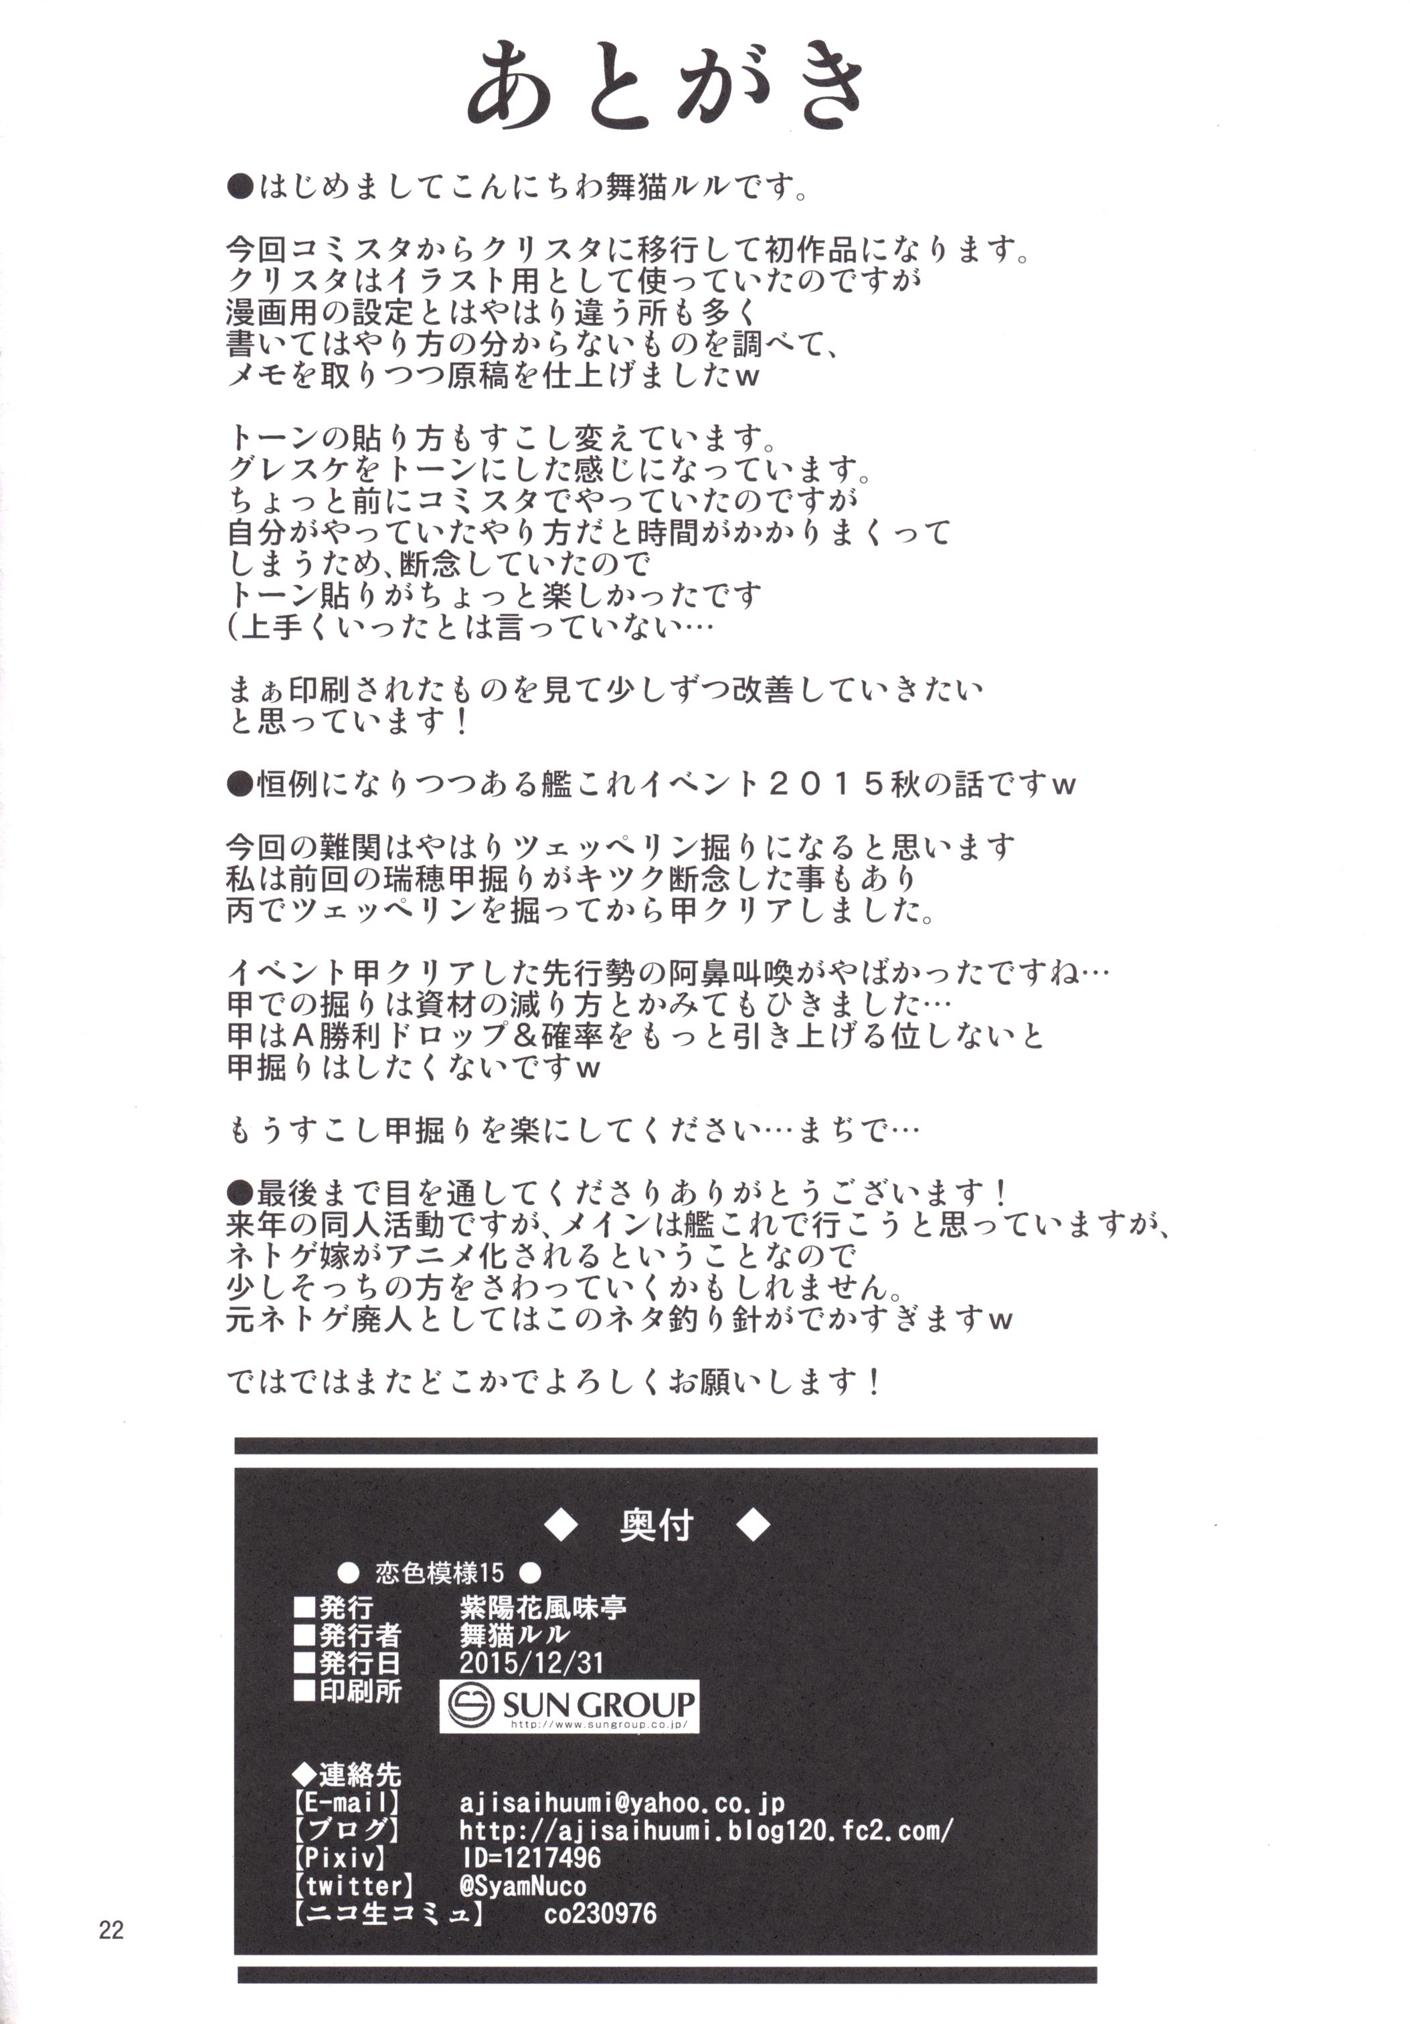 Koiiro Moyou 15 20